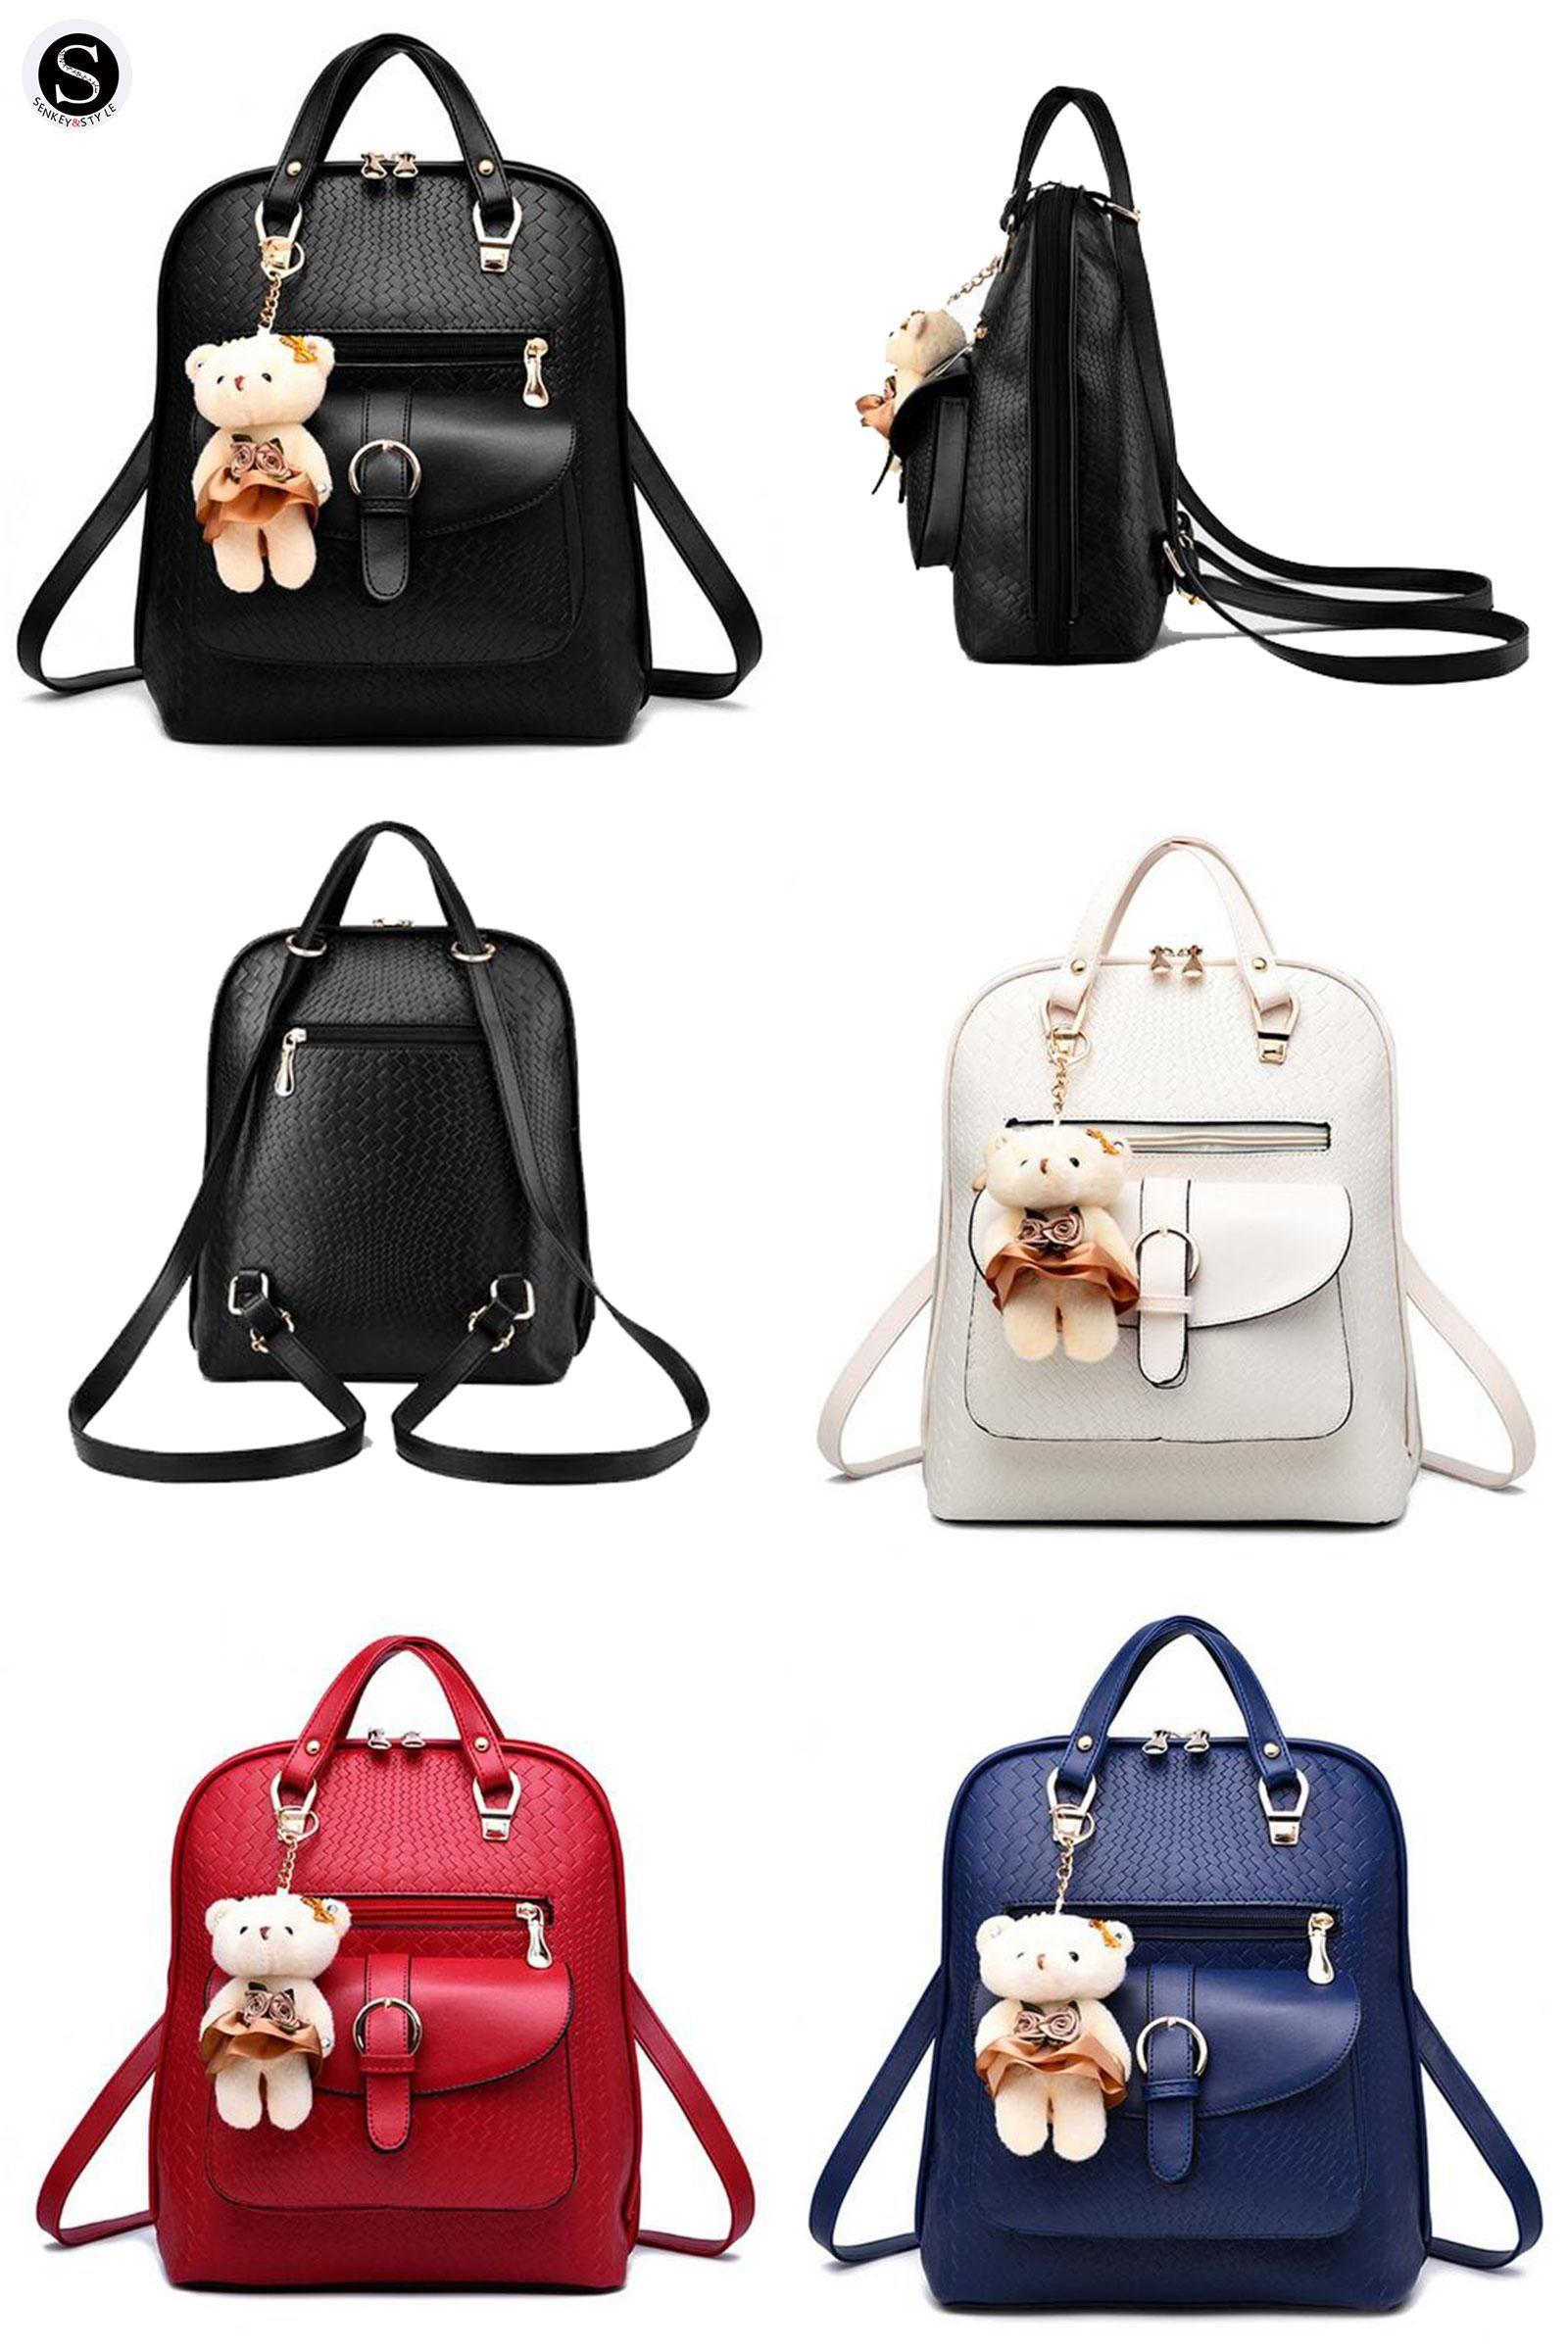 visit to senkey style women backpack 2017 famous brand school